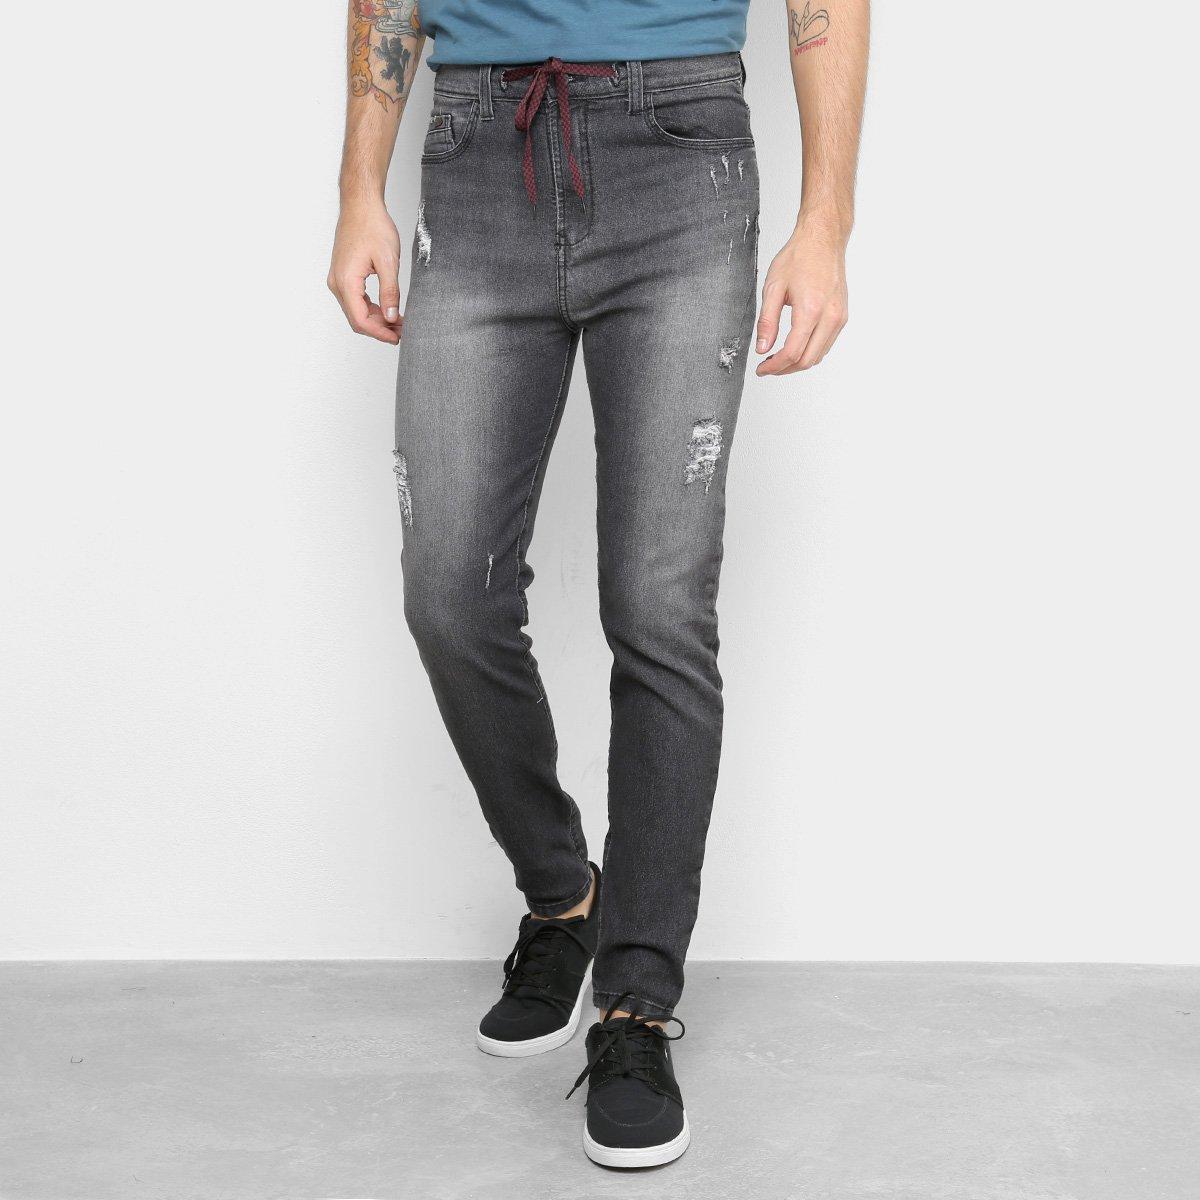 Calça Jeans HD Rocker Masculina